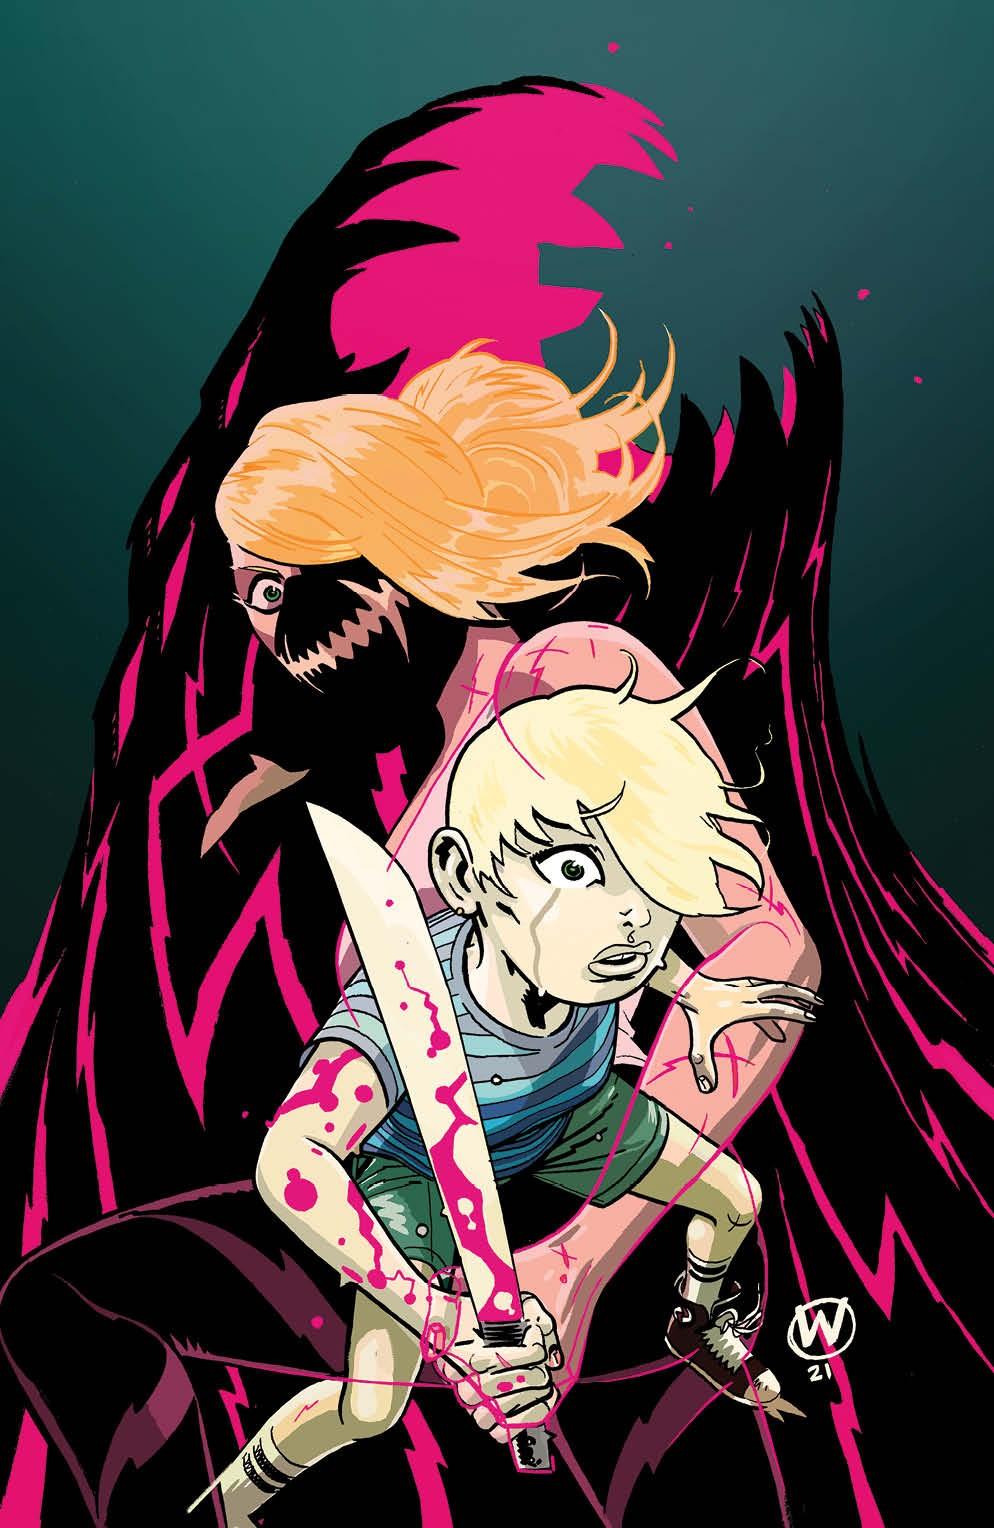 SomethingKillingChildren_018_Cover_B_Variant_Undressed ComicList Previews: SOMETHING IS KILLING THE CHILDREN #18